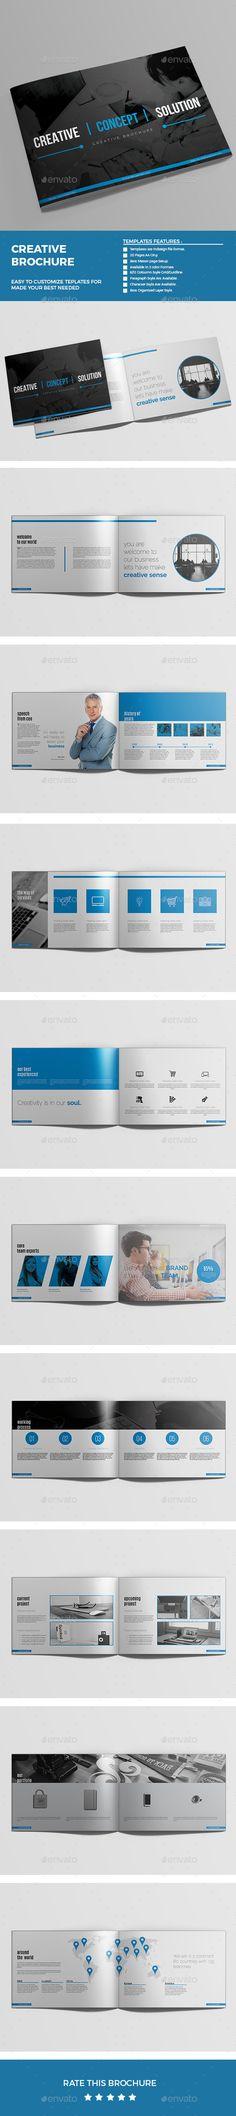 Brochure Template #brochure #design Download: http://graphicriver.net/item/brochure/12584002?ref=ksioks